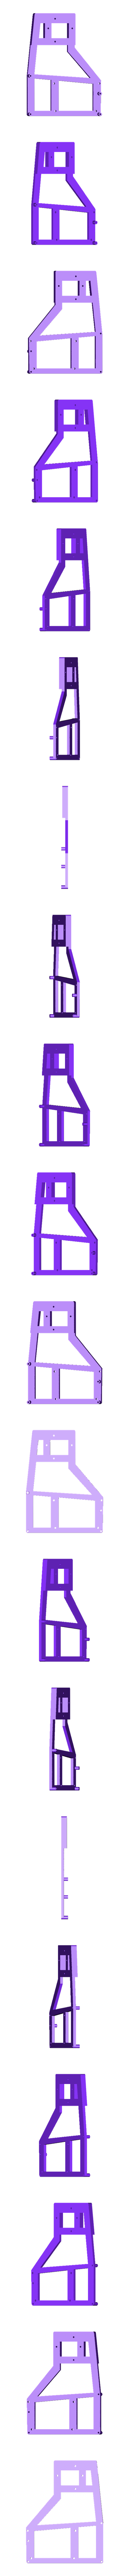 NCS_RaspberryRumbamount.stl Download free STL file NCS P3-v Steel Raspberry Rumba mount for NCS P3-v Steel • 3D printing object, trentjw